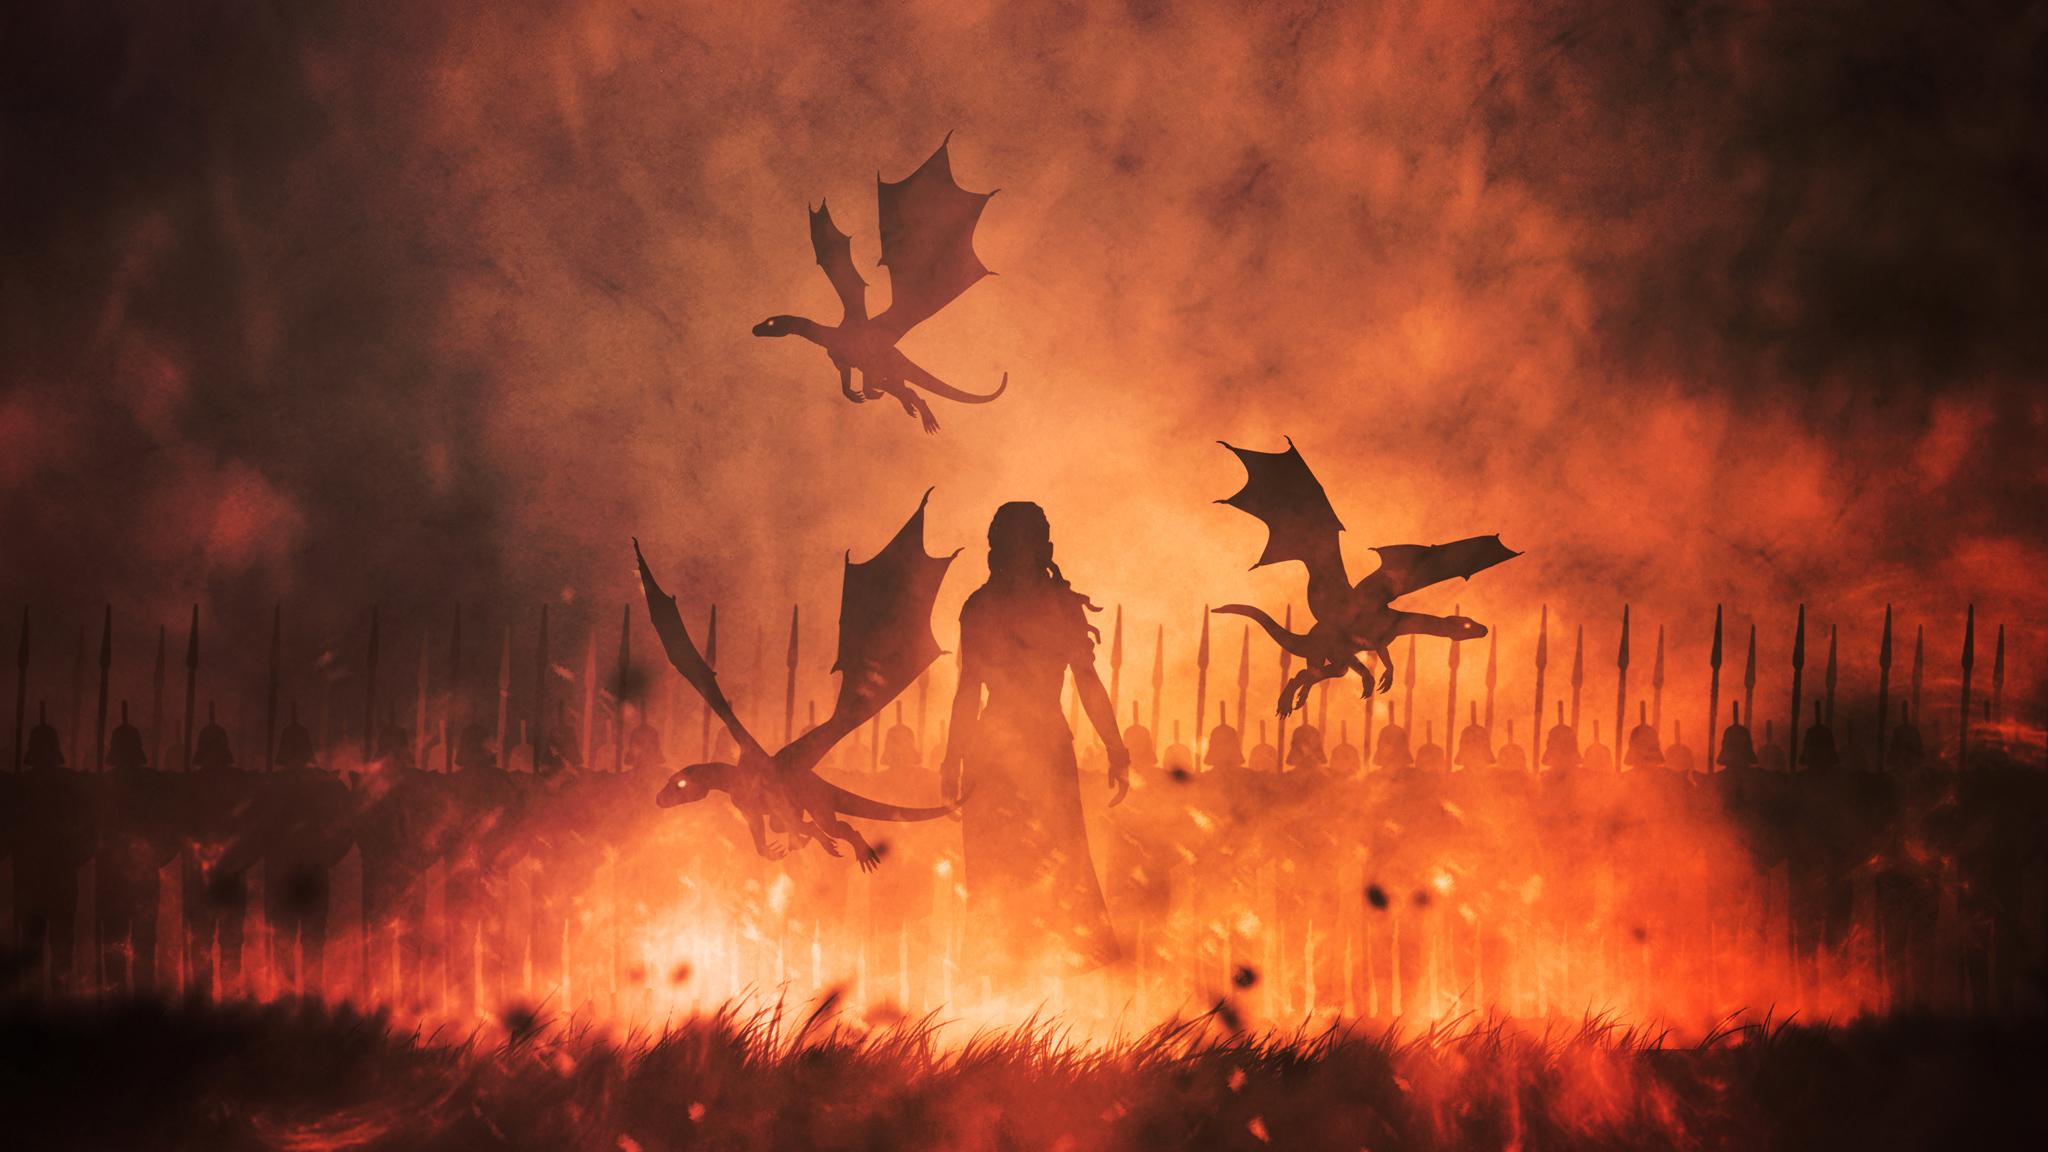 Daenerys Targaryen And Dragons In Fire Wallpaper Hd Tv